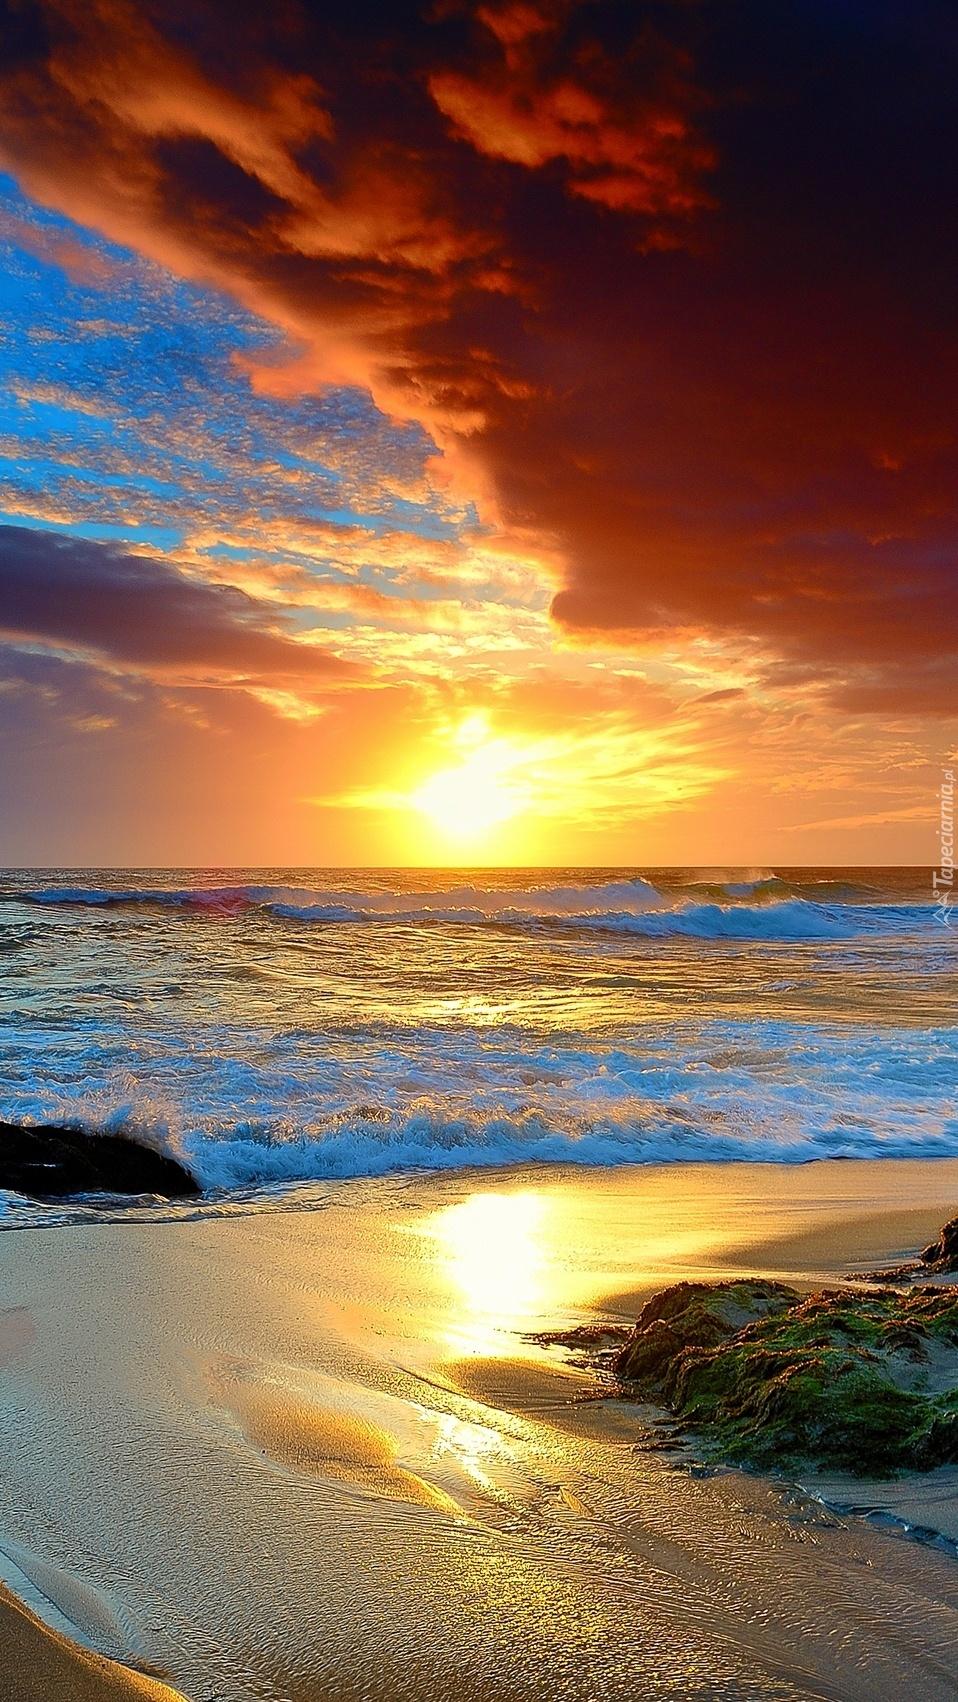 Fall Morning Wallpapers For Samsung 4 Morze I Plaża W Promieniach Słońca Tapeta Na Telefon